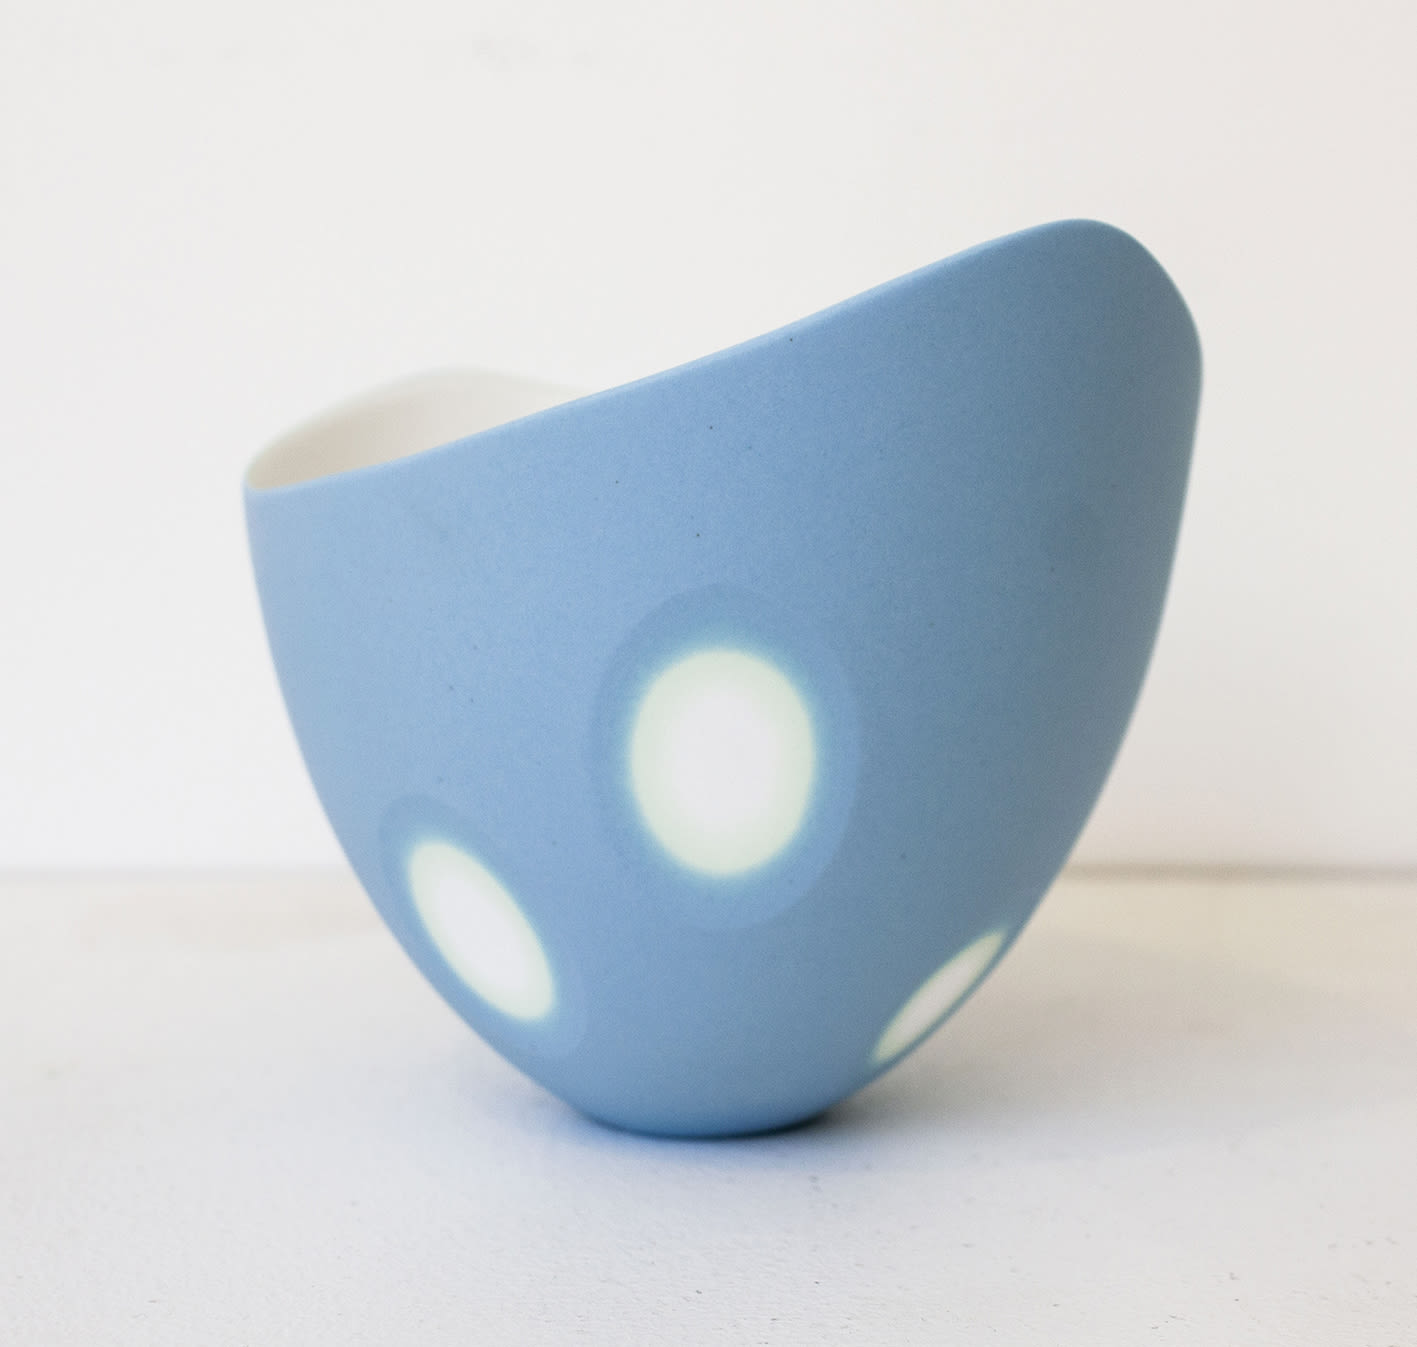 "<span class=""link fancybox-details-link""><a href=""/artists/60-sasha-wardell/works/7783-sasha-wardell-blue-space-wavy-rim-bowl-2021/"">View Detail Page</a></span><div class=""artist""><strong>Sasha Wardell</strong></div> <div class=""title""><em>Blue 'Space' Wavy Rim Bowl</em>, 2021</div> <div class=""medium"">bone china</div> <div class=""dimensions"">h. 11 cm</div><div class=""copyright_line"">Own Art: £19 x 10 Months, 0% APR</div>"